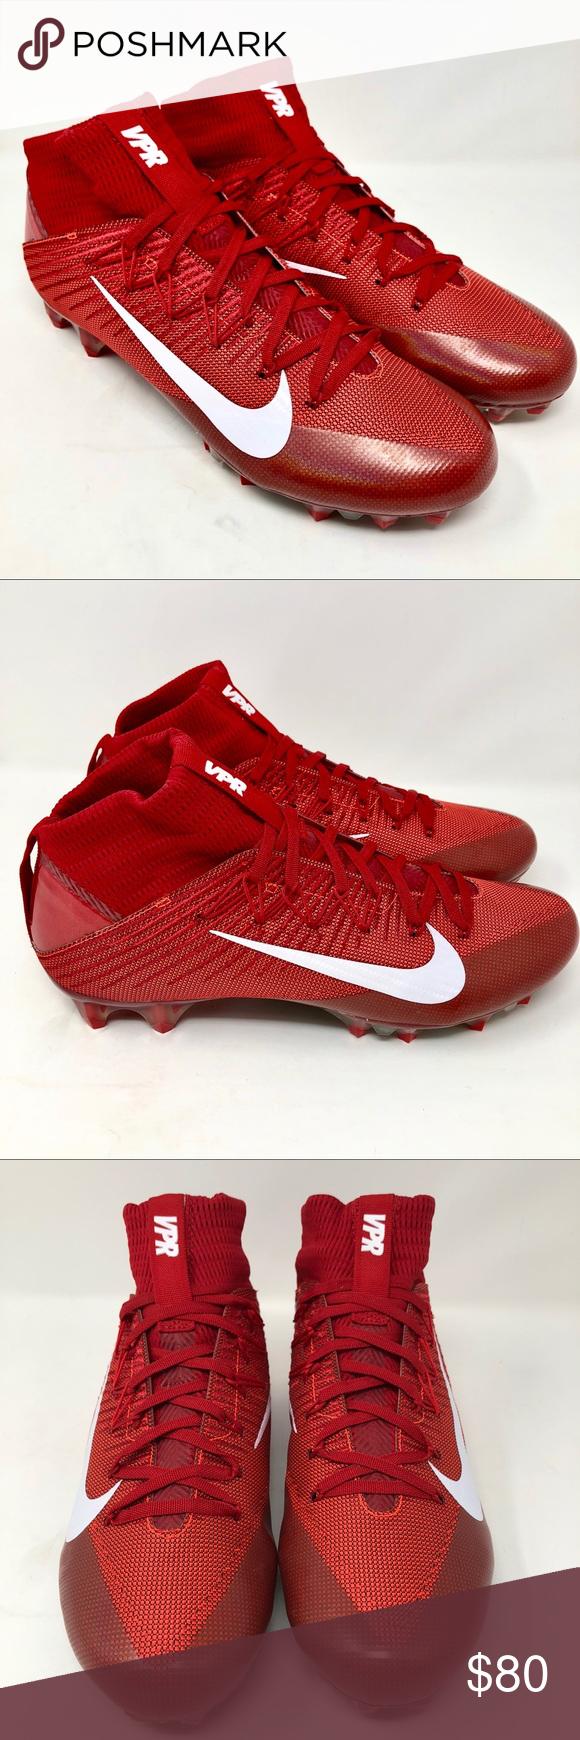 Nike Vapor Untouchable Football Cleats 824470 616 NWT   NWT My Posh 88b9f9